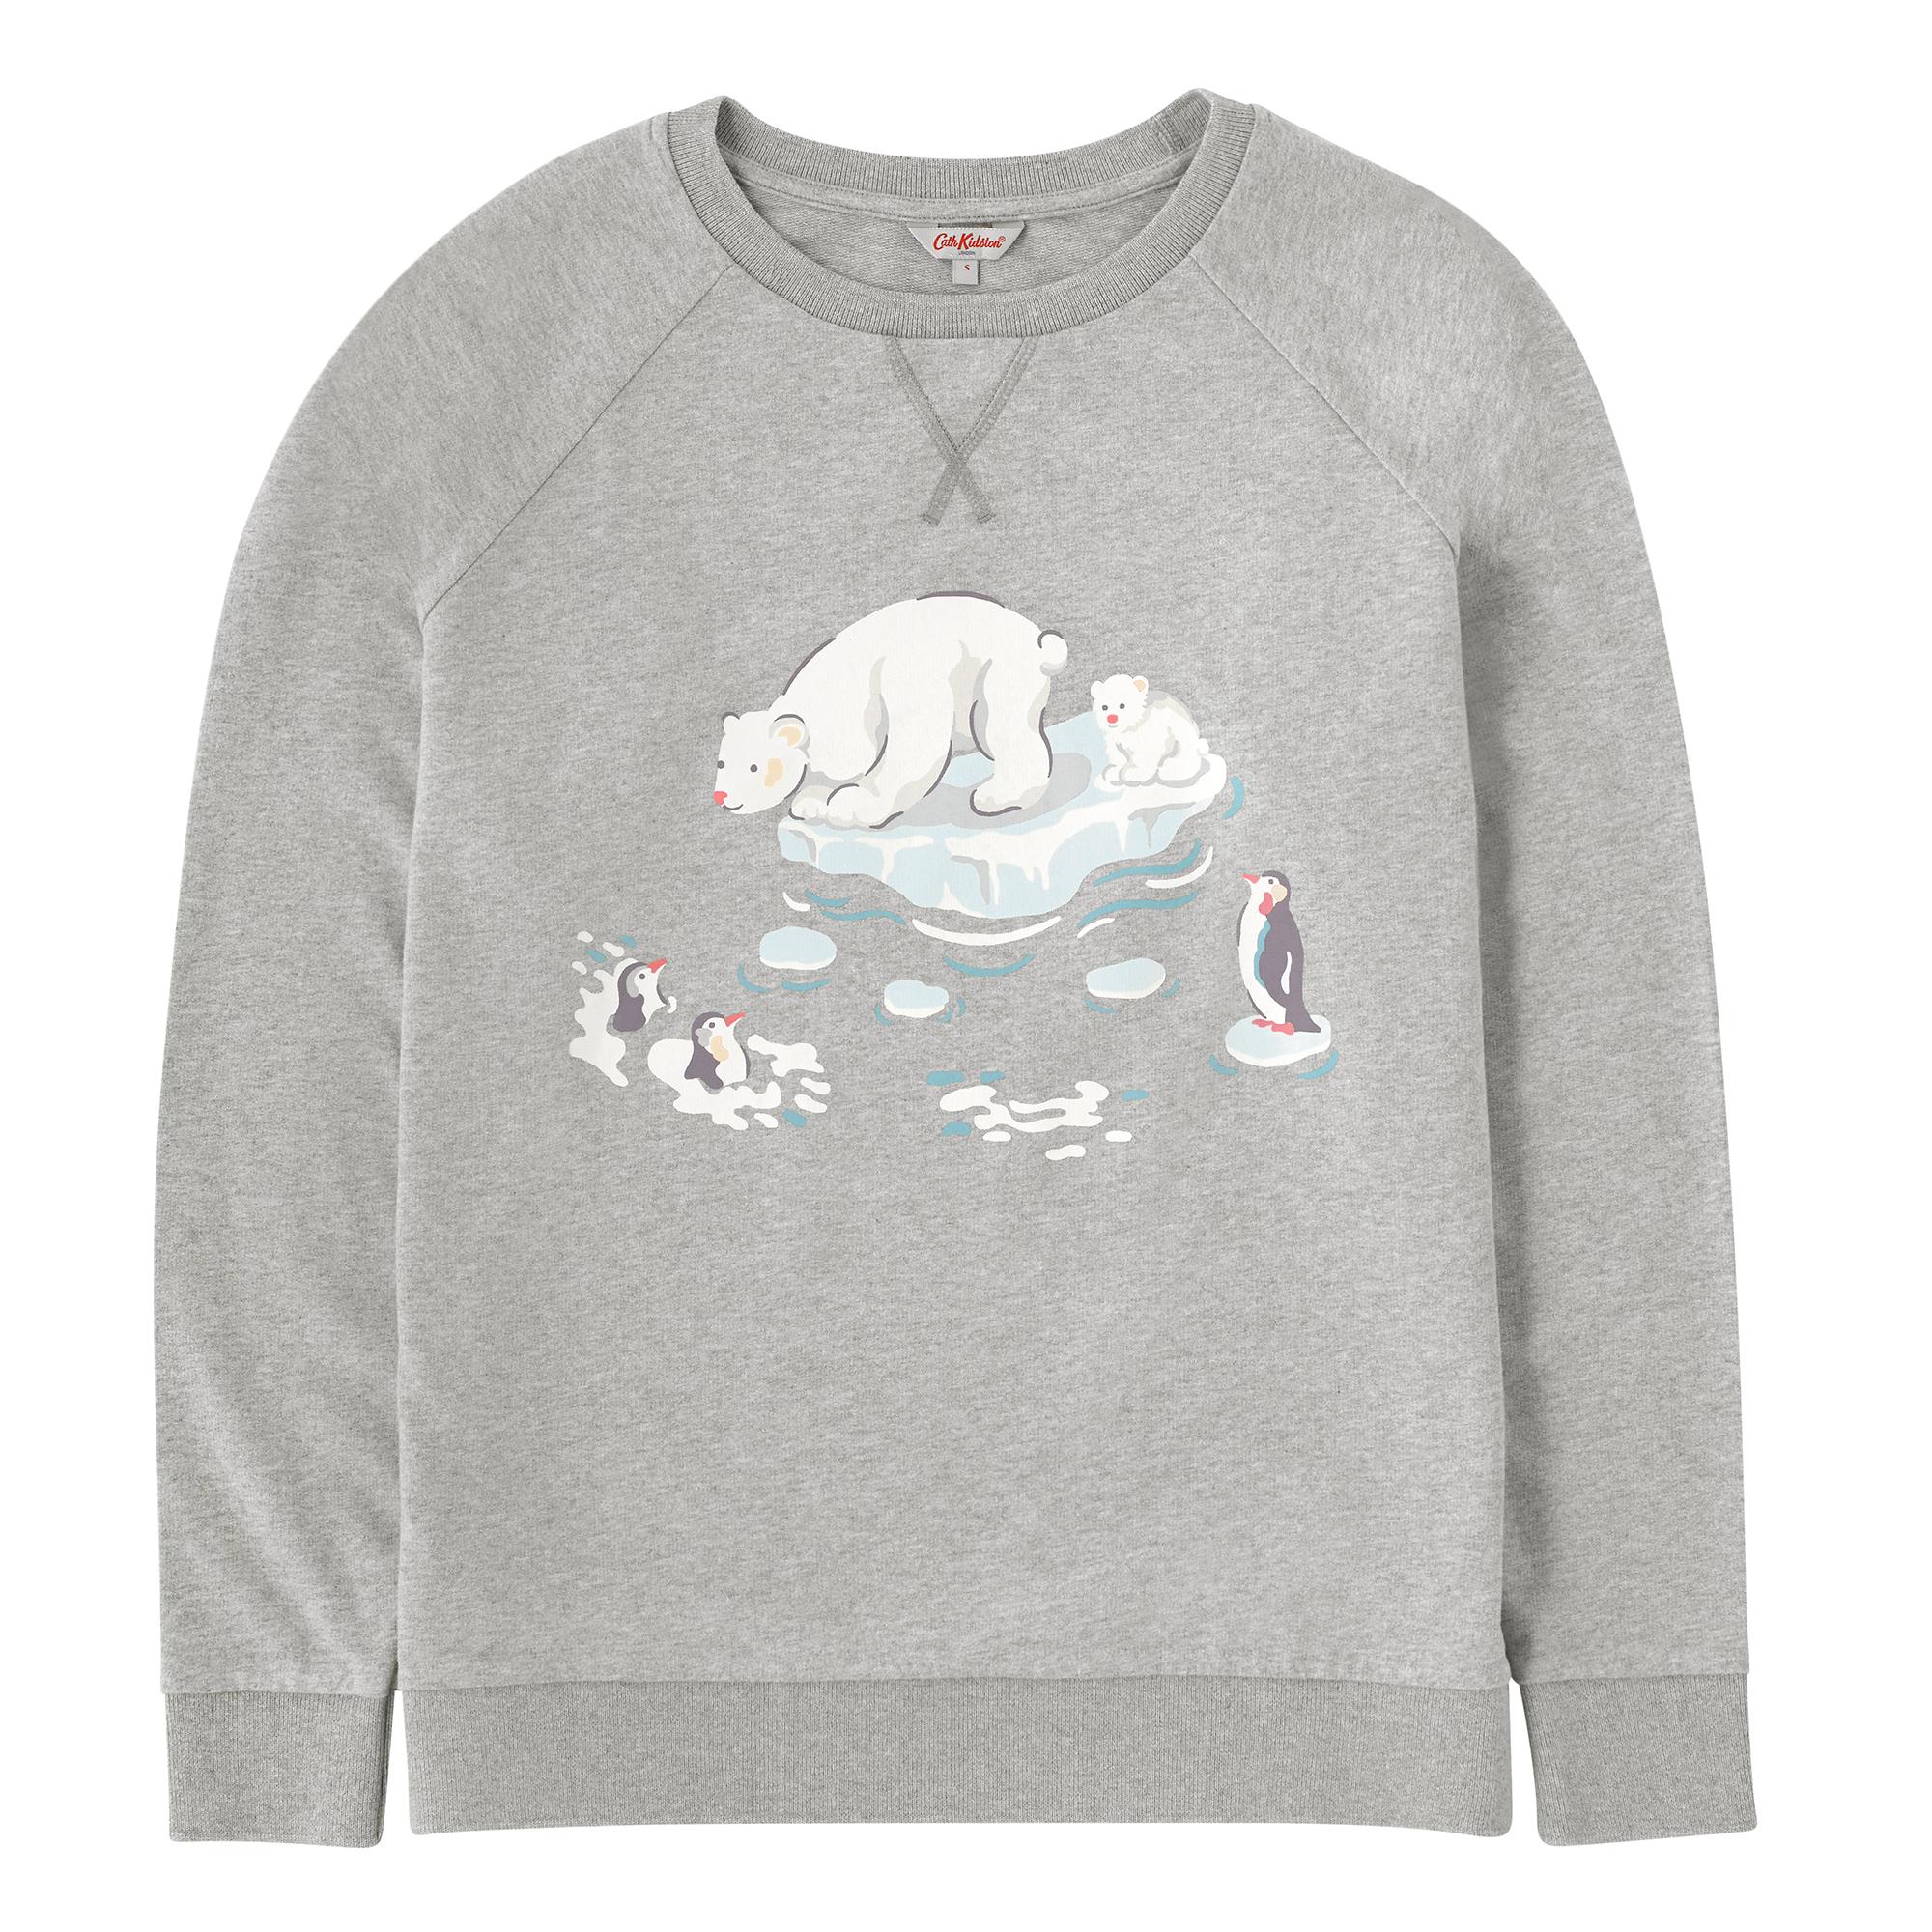 Cath Kidston Polar Bear Cotton Sweatshirt